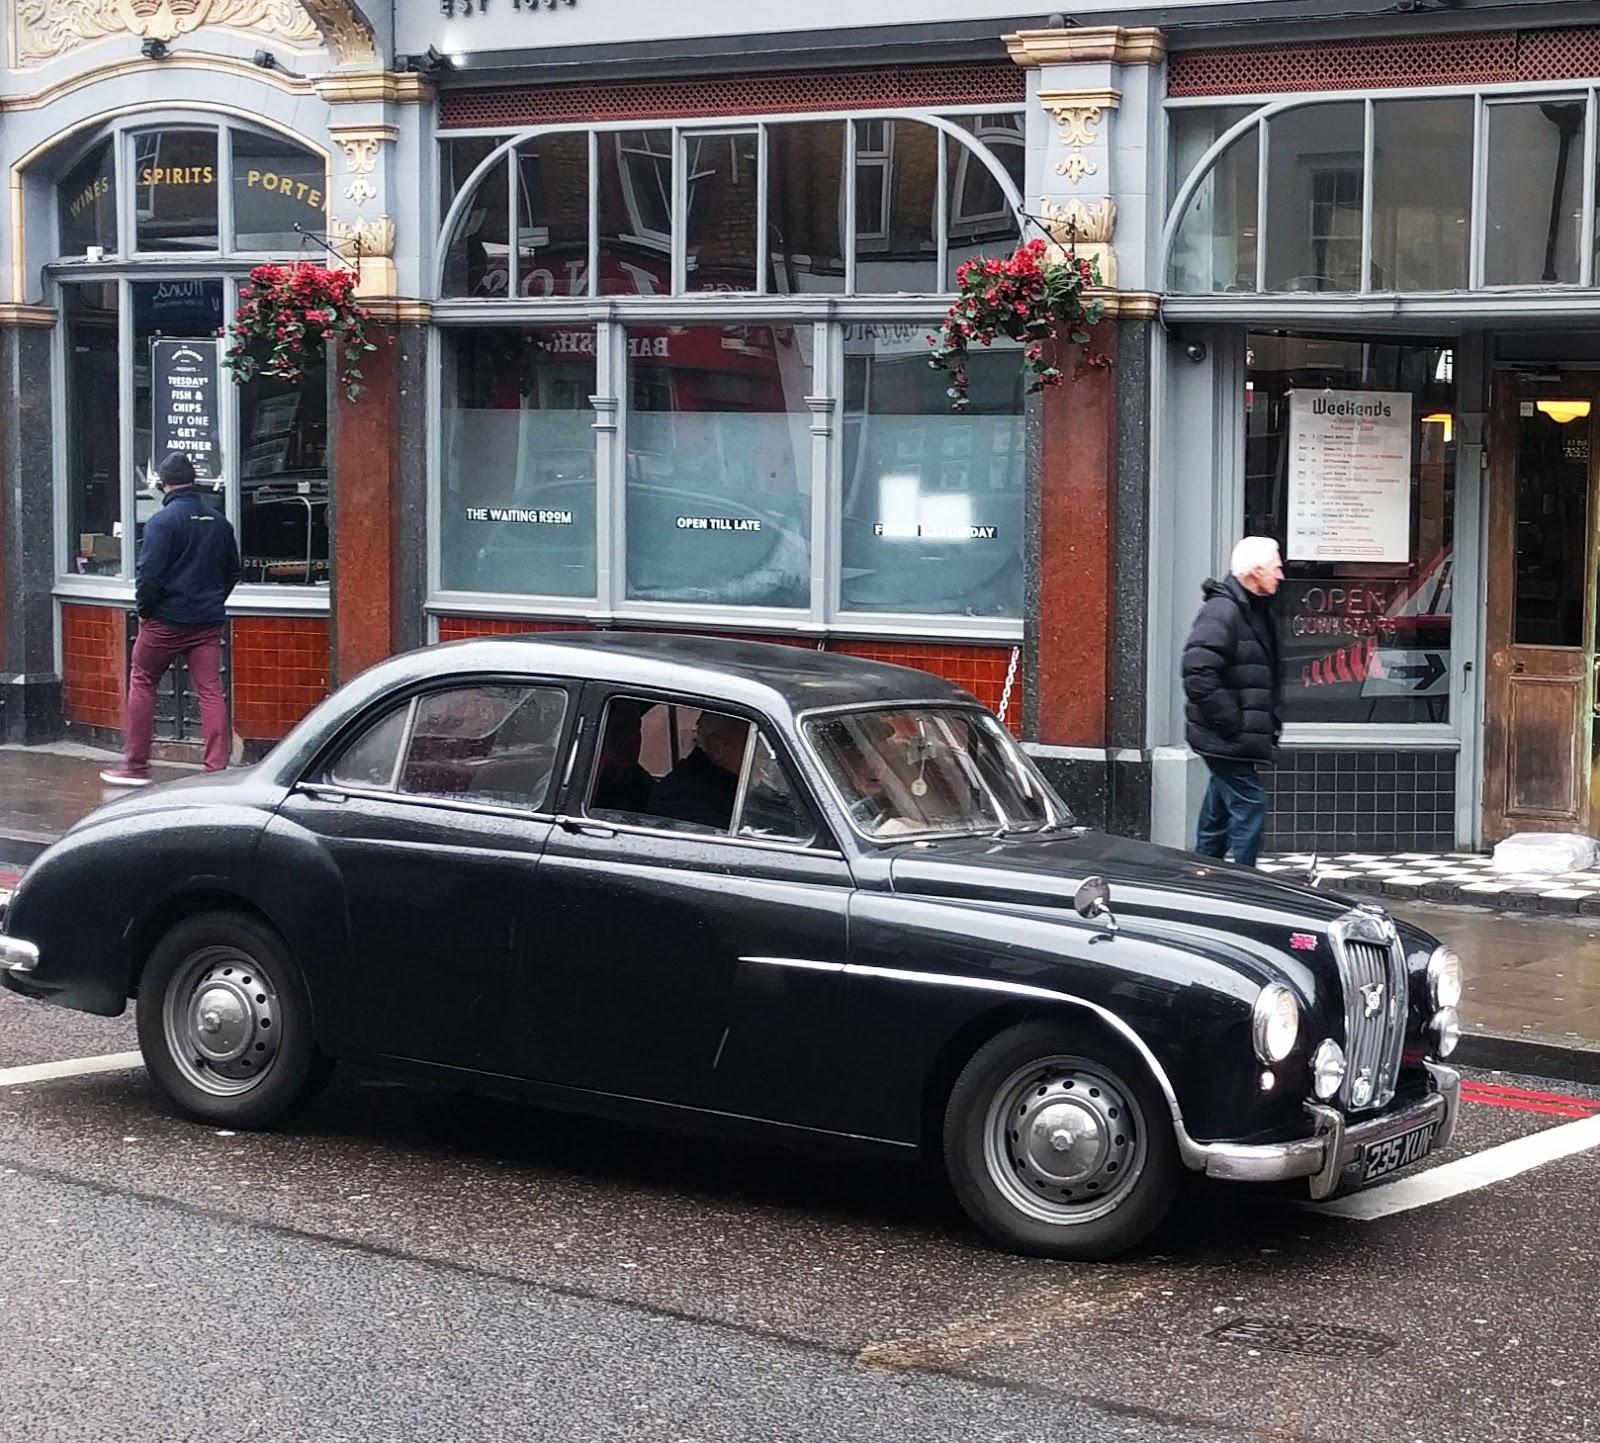 Vintage Car spotting in streets of London